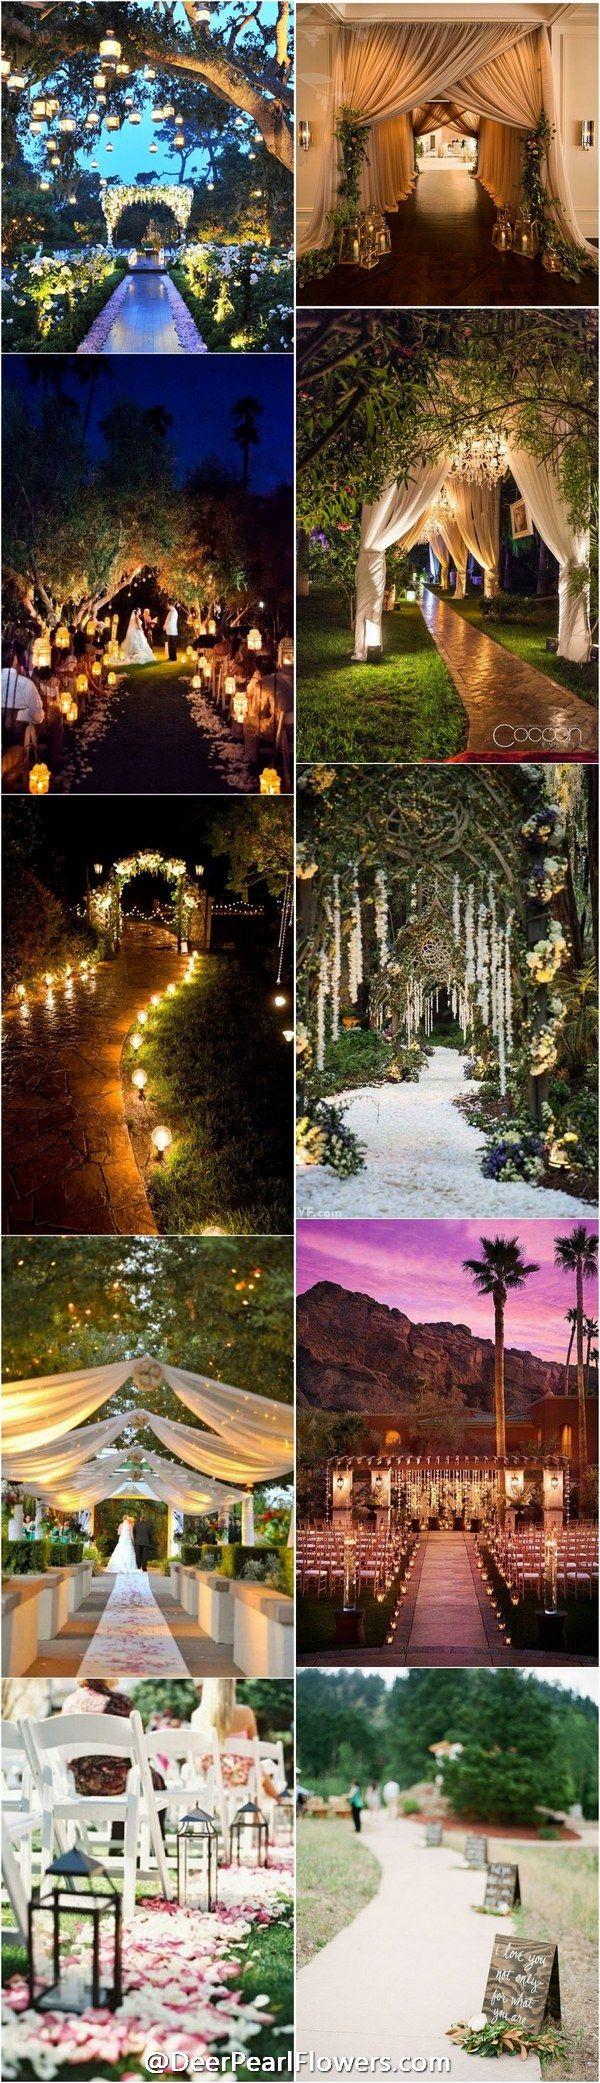 Wedding Entrance Walkway Decor Ideas / http://www.deerpearlflowers.com/wedding-entrance-walkway-decor-ideas/